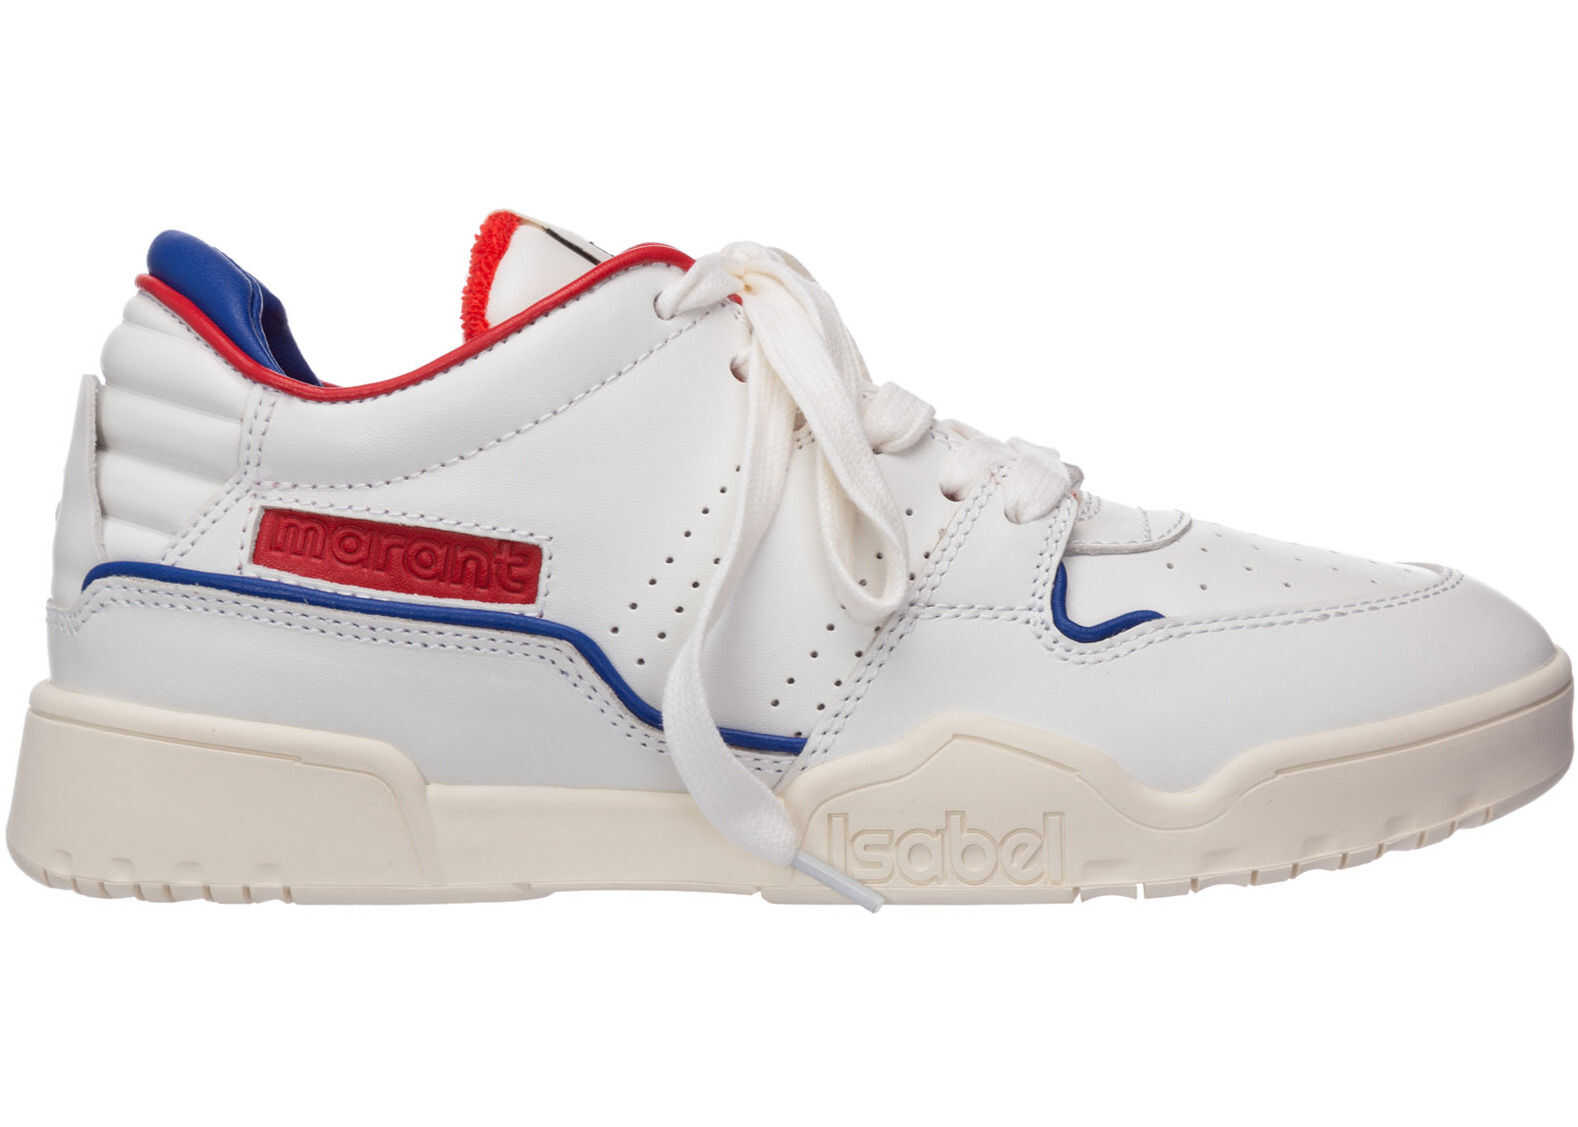 Isabel Marant Sneakers Emree White